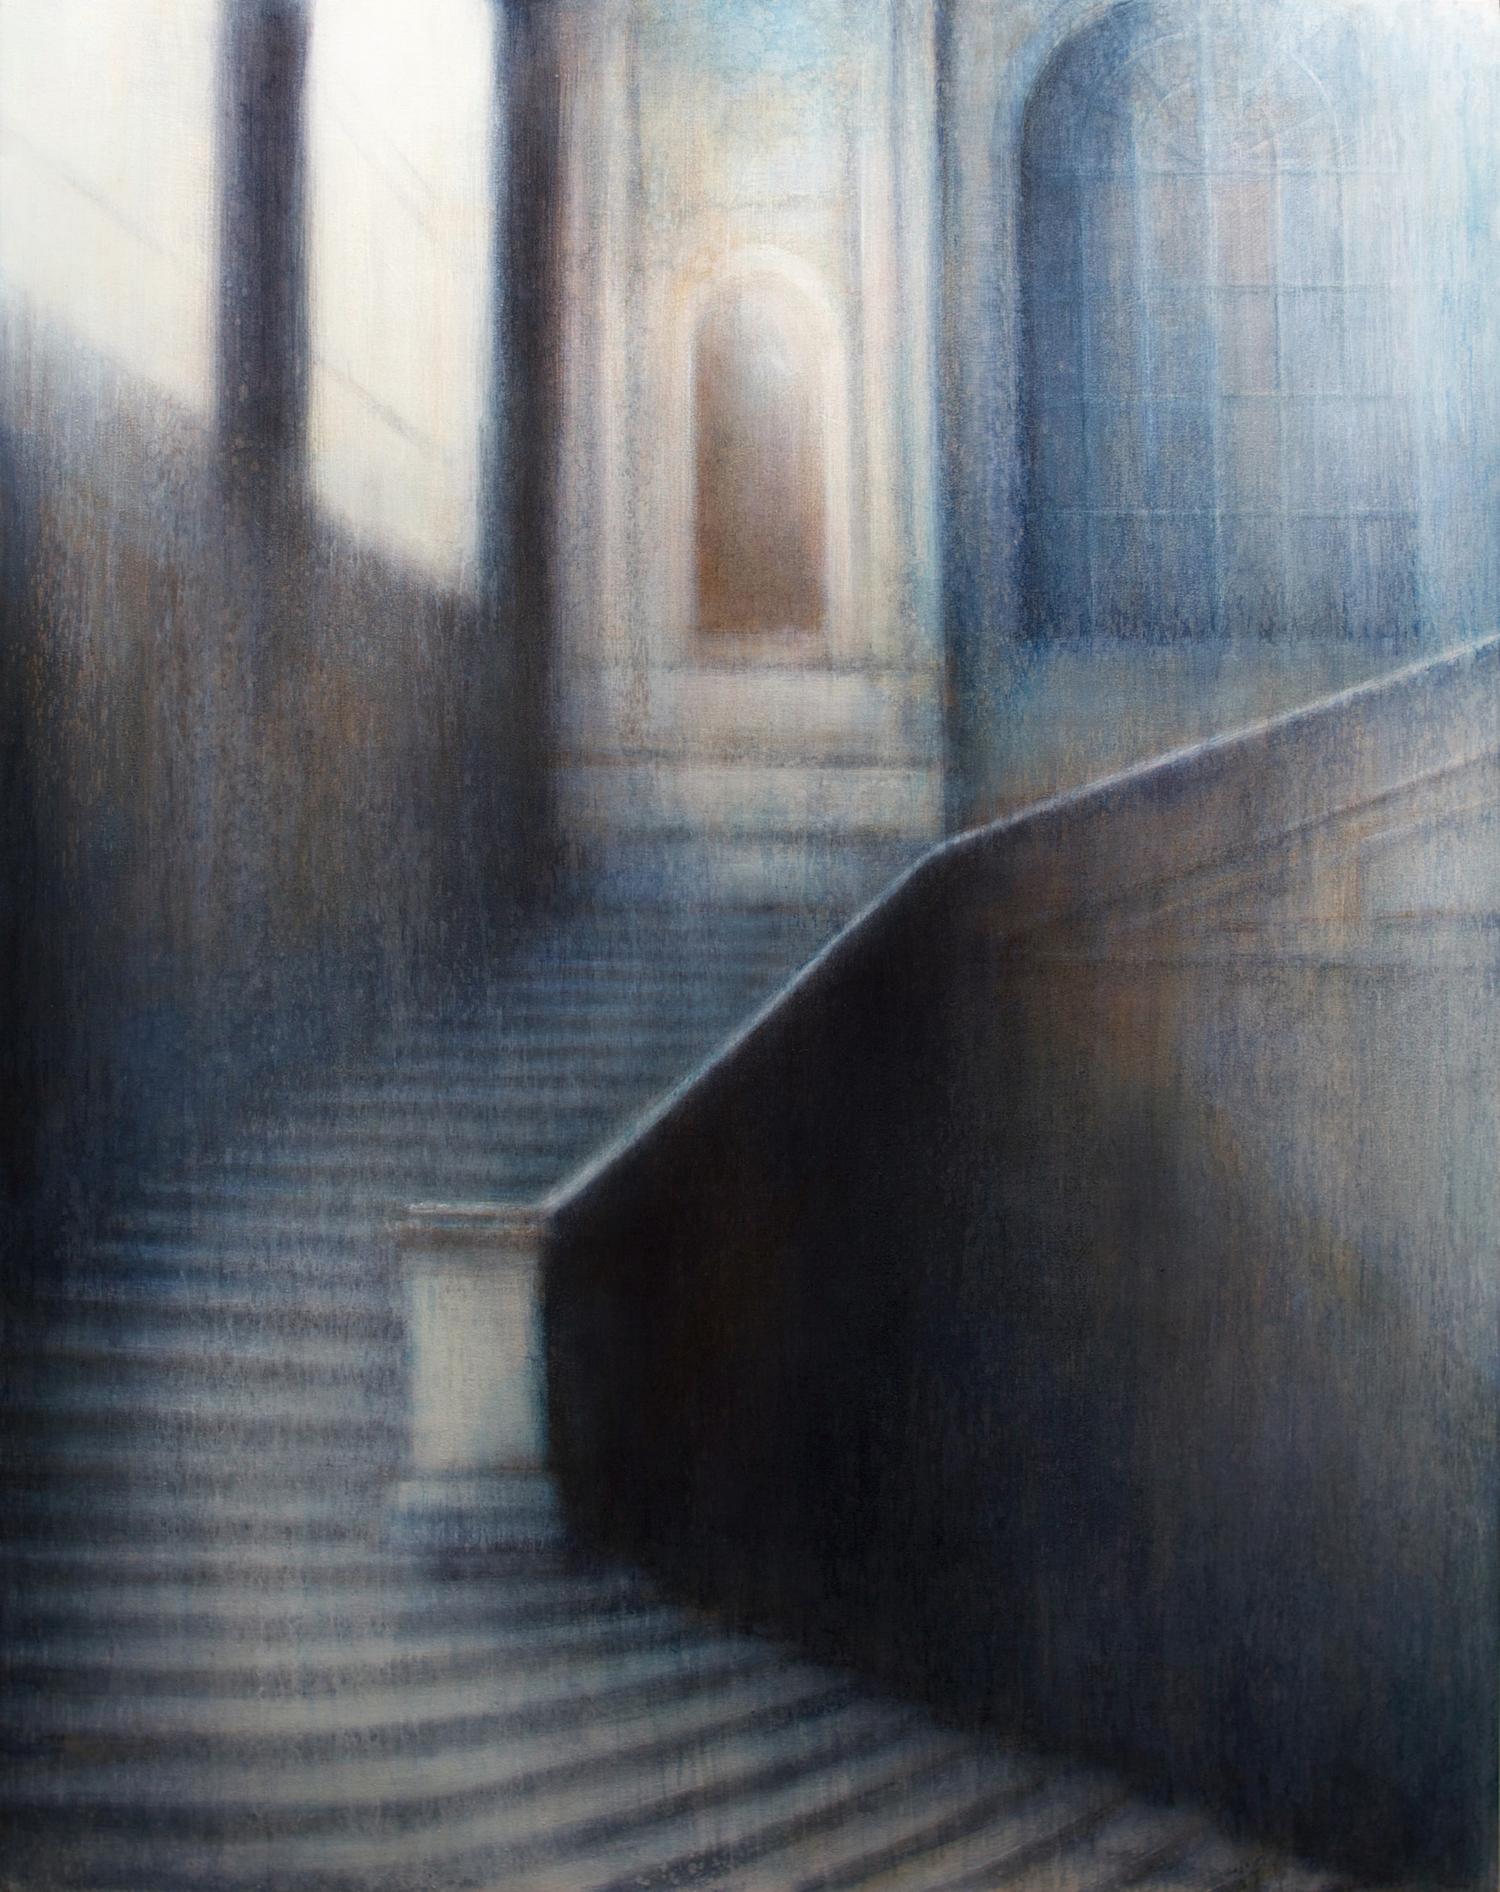 "Maya Kulenovic: RAIN (INTERIOR), 2017, oil on canvas, 61"" X 48.7"", 155cm X 124cm. 'Build' Series. (Architecture; Interior)"